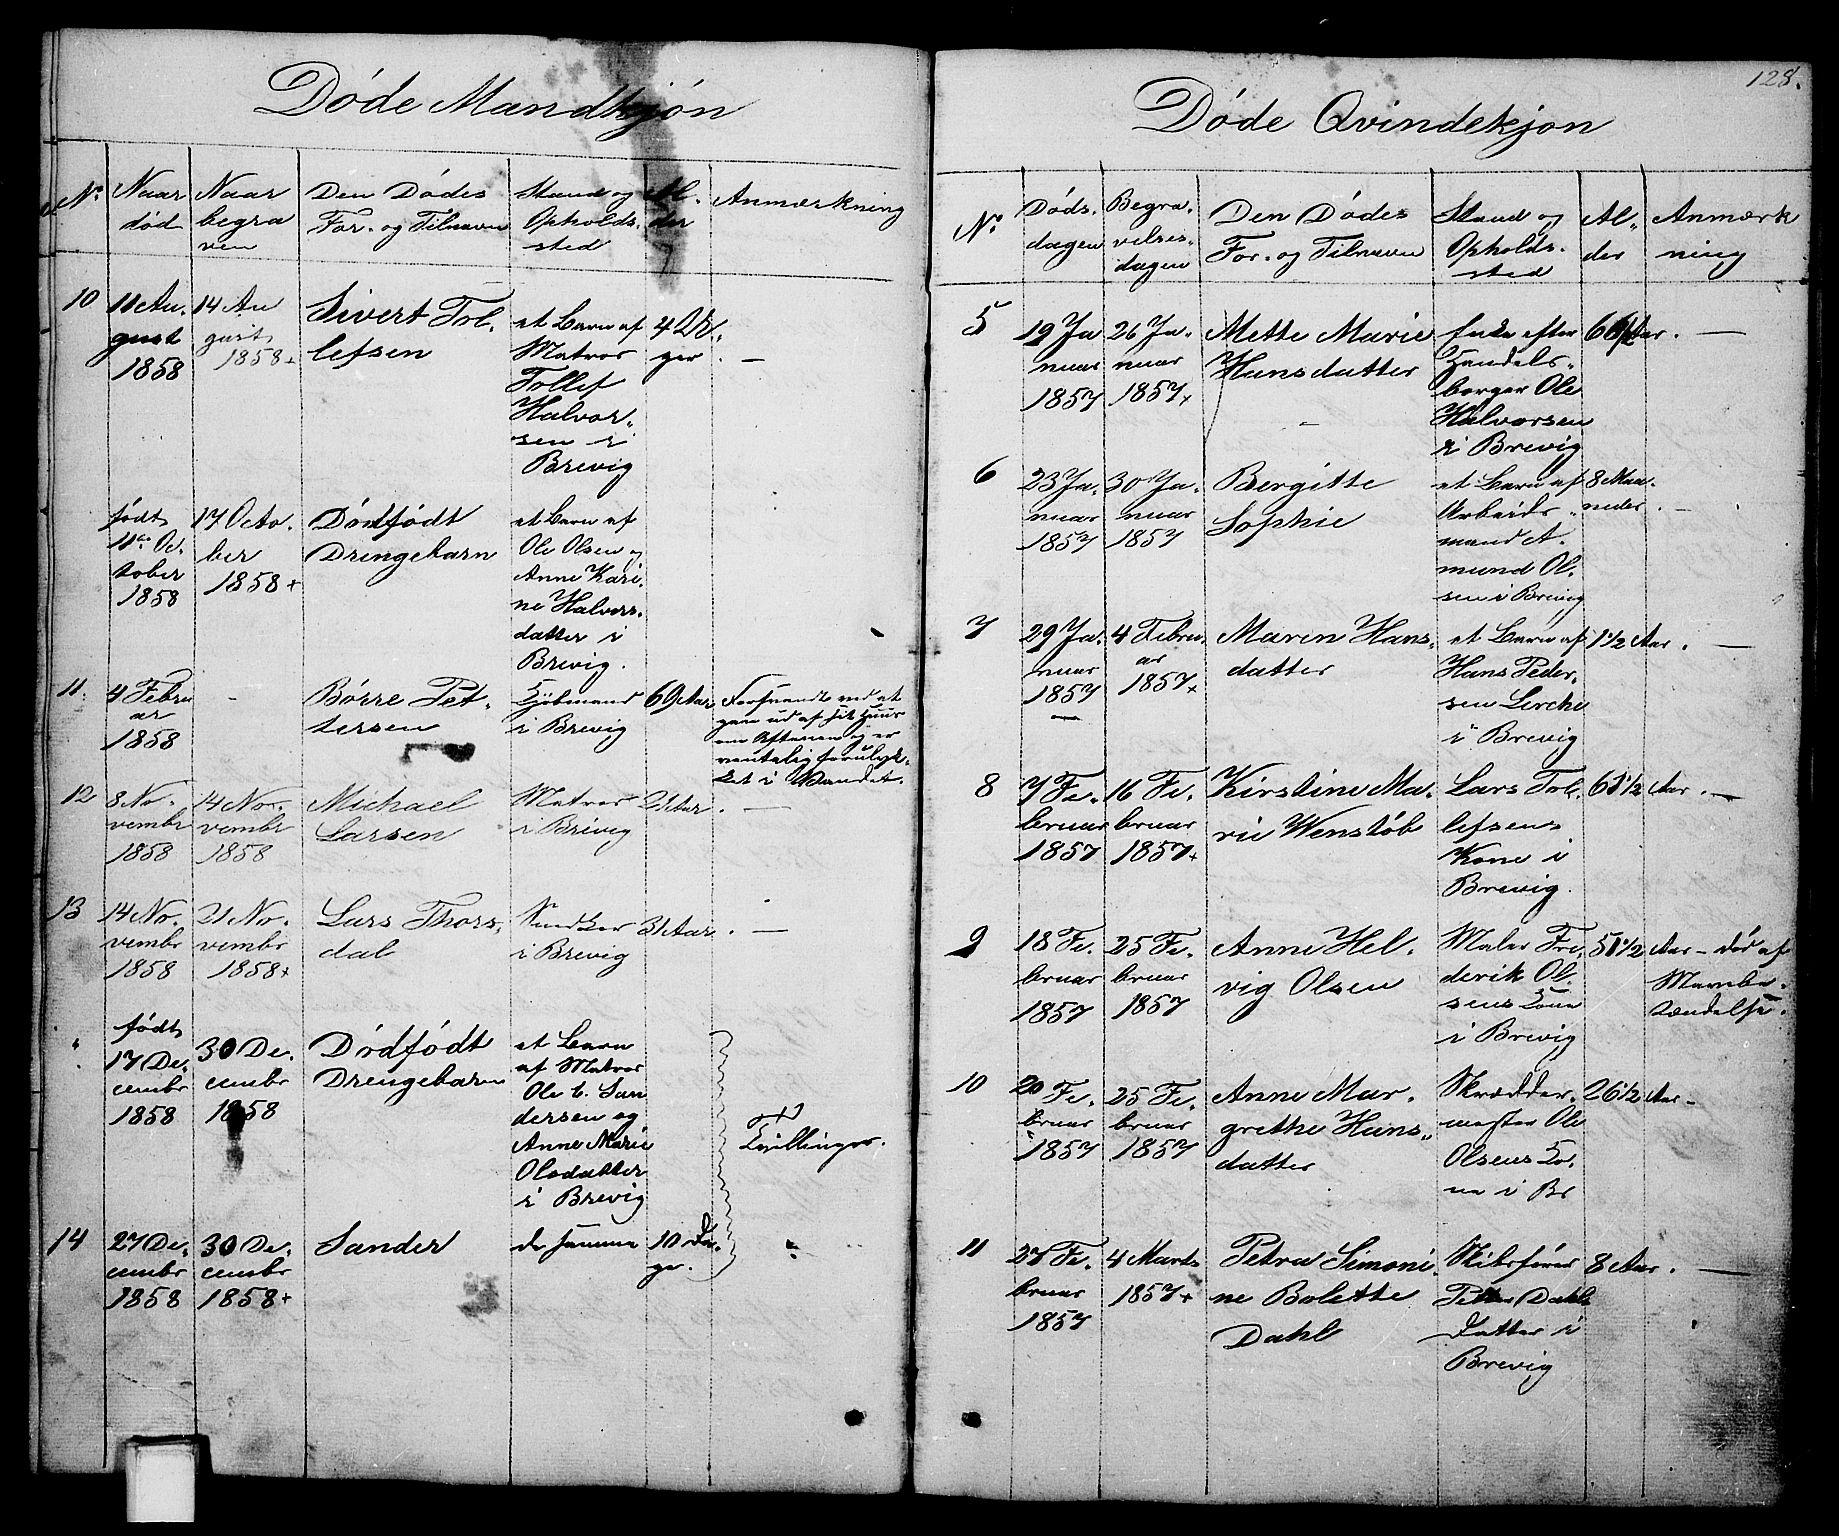 SAKO, Brevik kirkebøker, G/Ga/L0002: Klokkerbok nr. 2, 1846-1865, s. 128